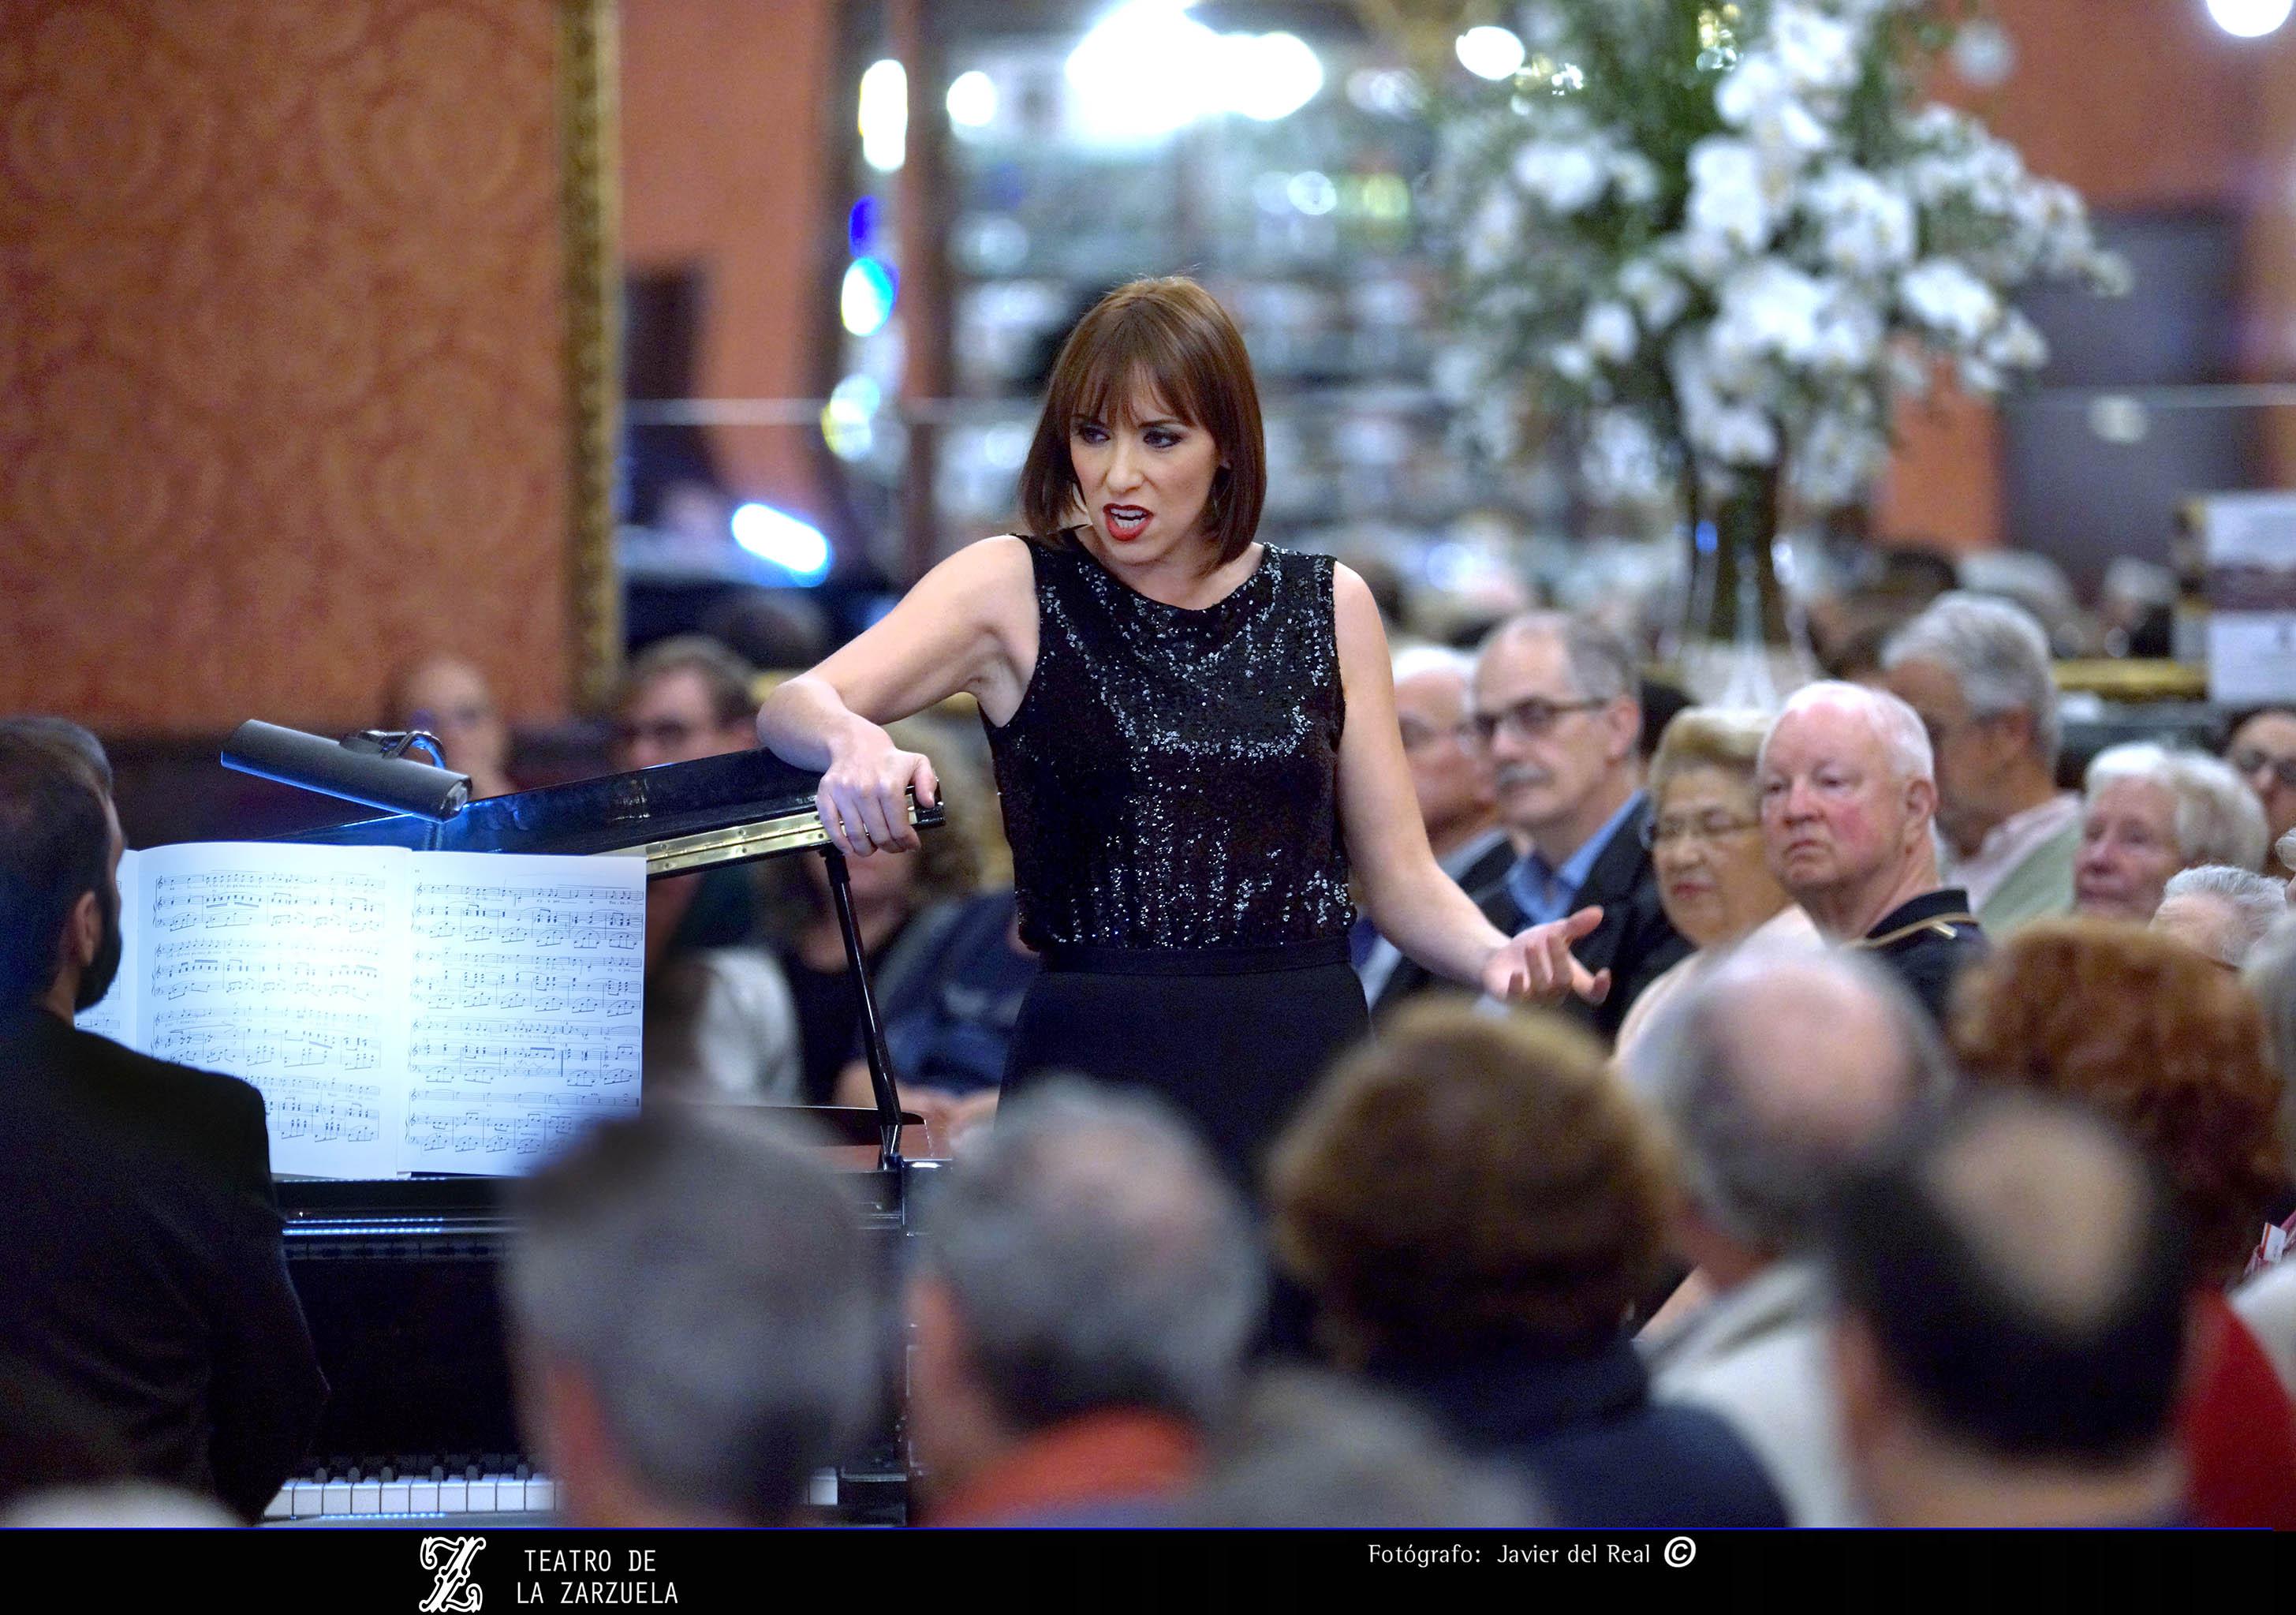 "Carmen Romeu y Rubén Fernández Aguirre: encantadora ""tarde francesa"" en la Zarzuela"